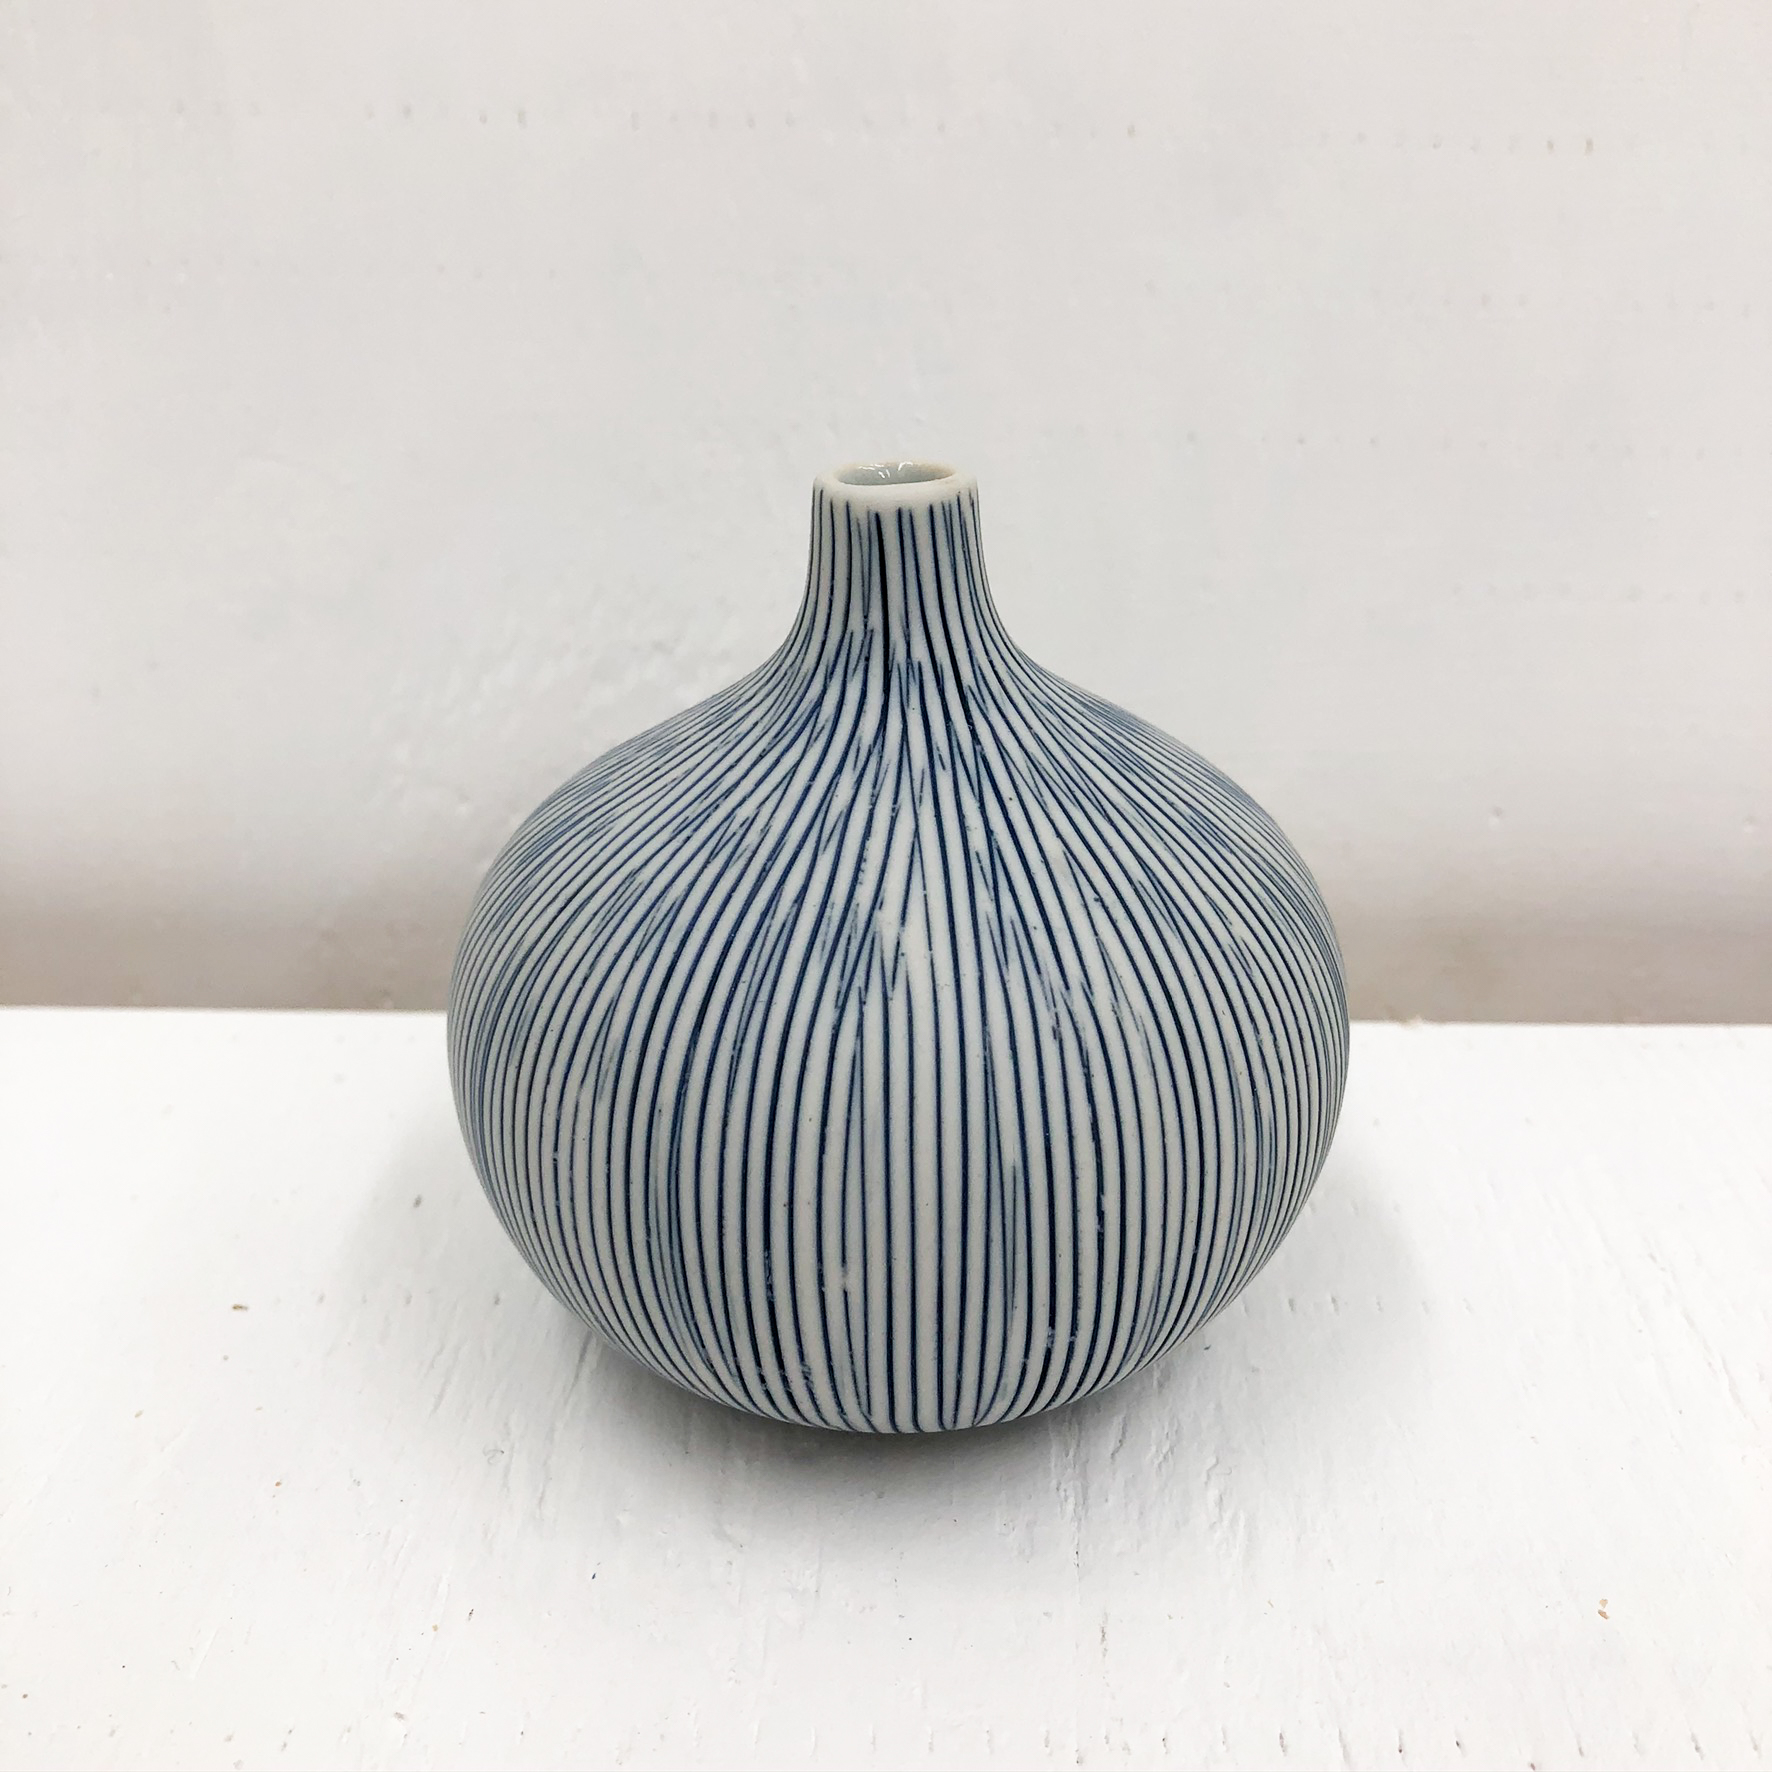 Congo Tiny L Handmade Vase - White & Blue Stripe